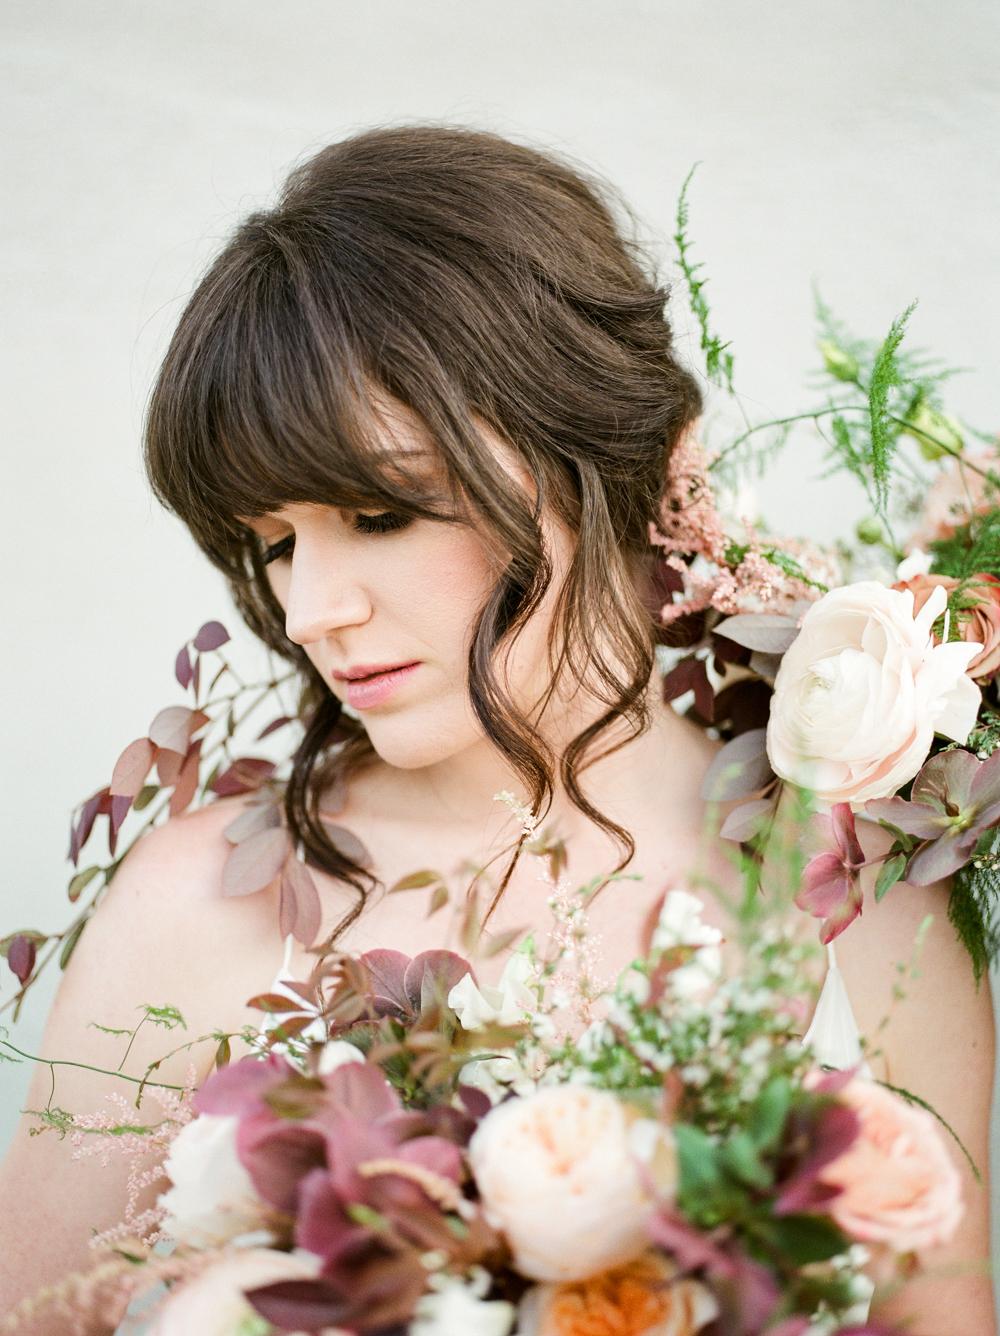 A lovely houston bride_wedding_Christine Gosch_www.christinegosch.com_Houston, TX-1.jpg